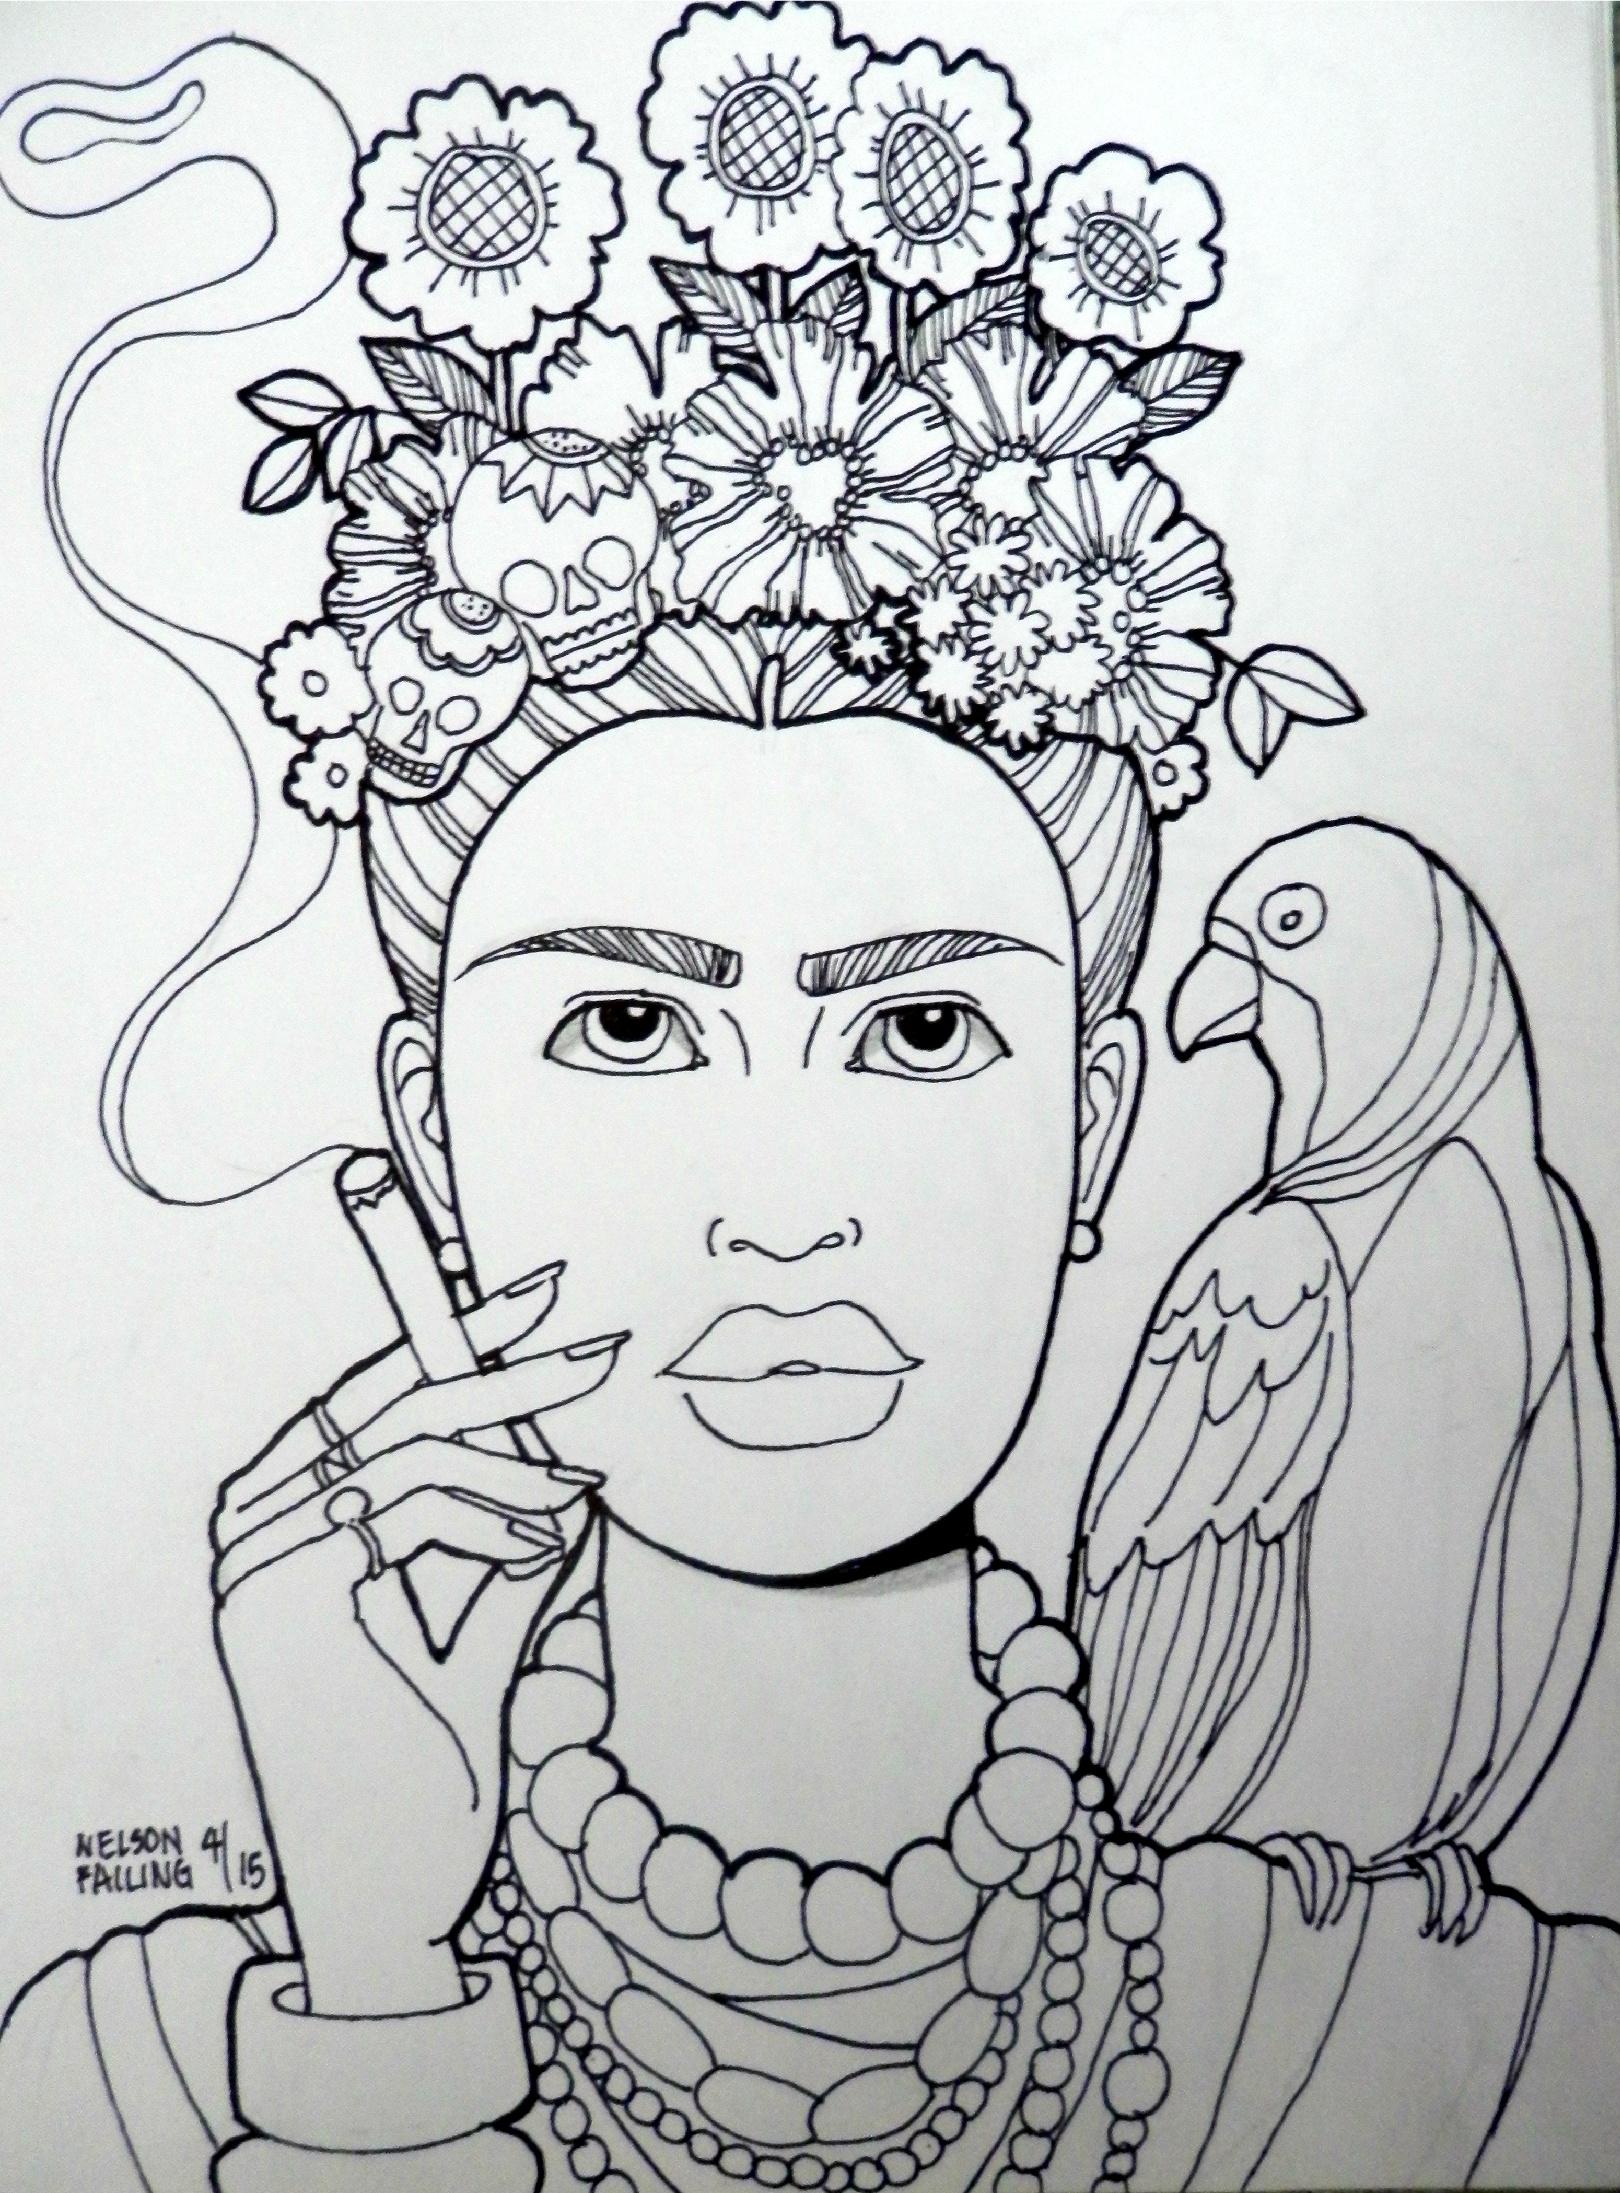 1620x2193 Frida Kahlo Nelson Failing The Art Colony Frida